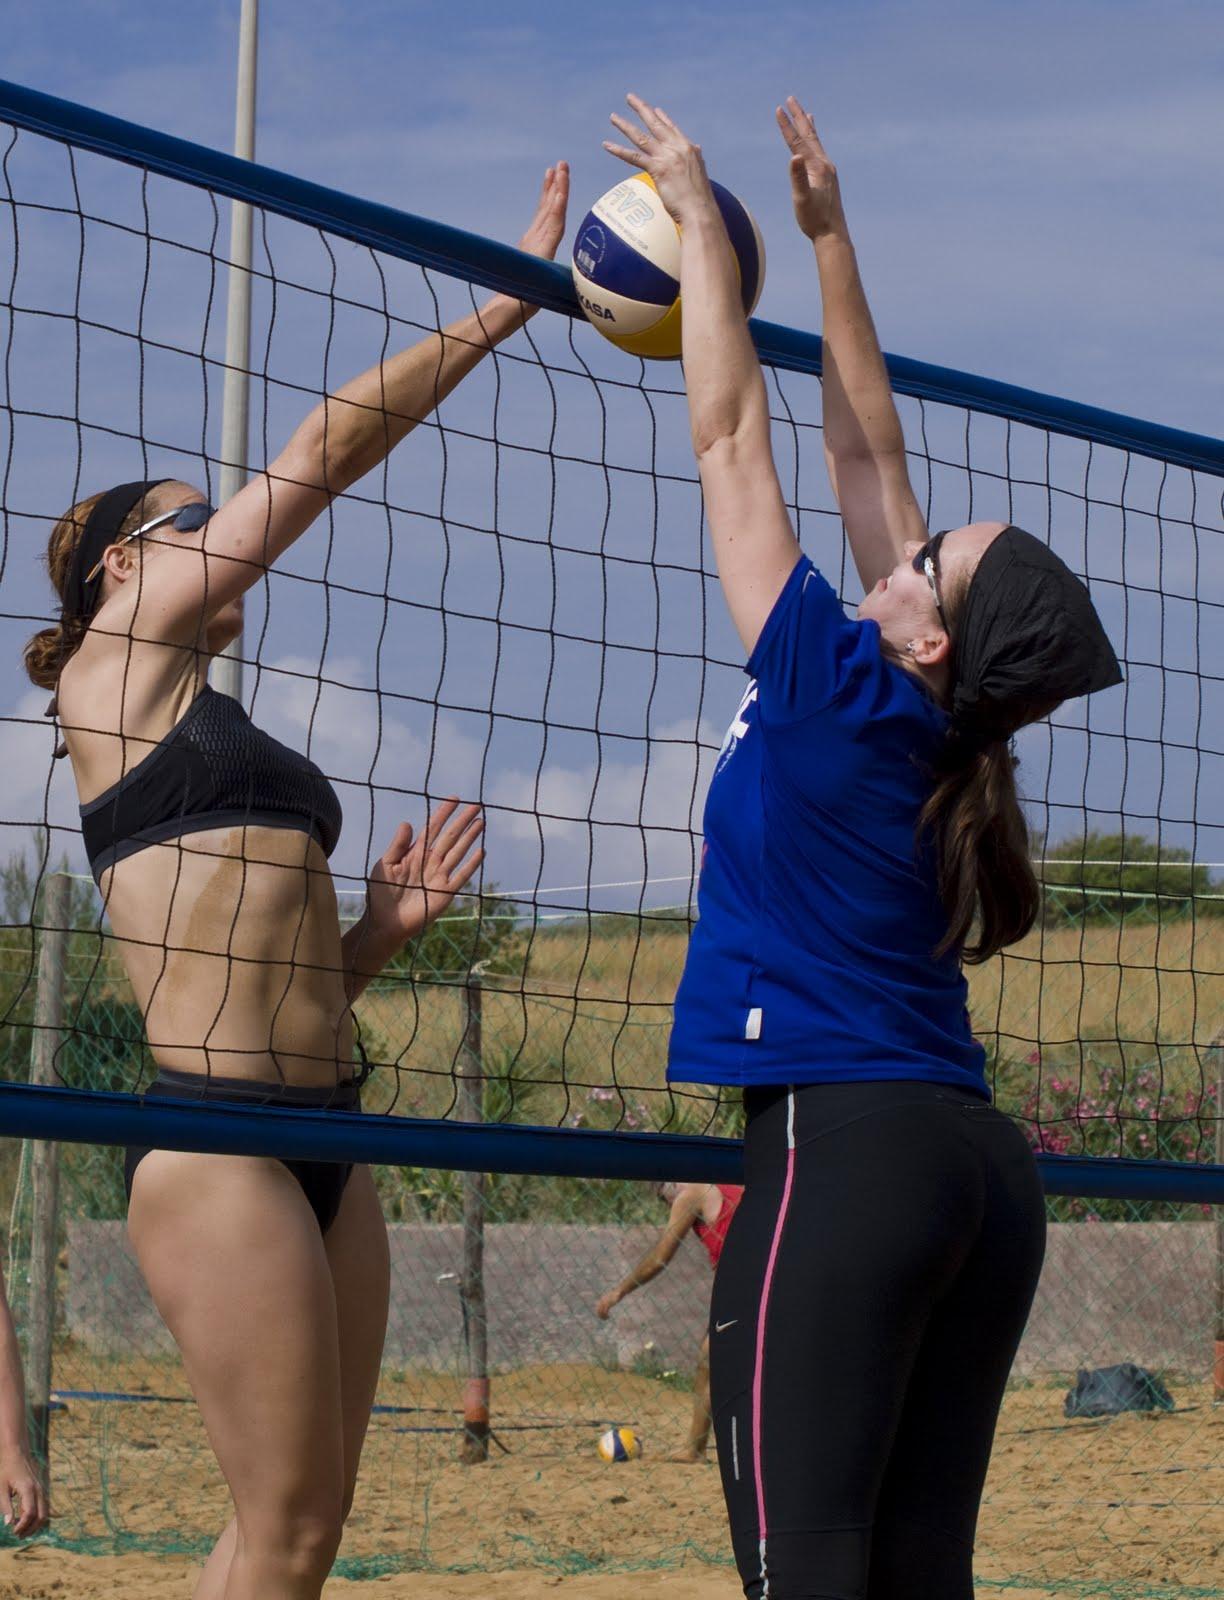 Club Tournament: Α.Σ. Νέας Κυδωνίας vs Mouhijarvi, 2013